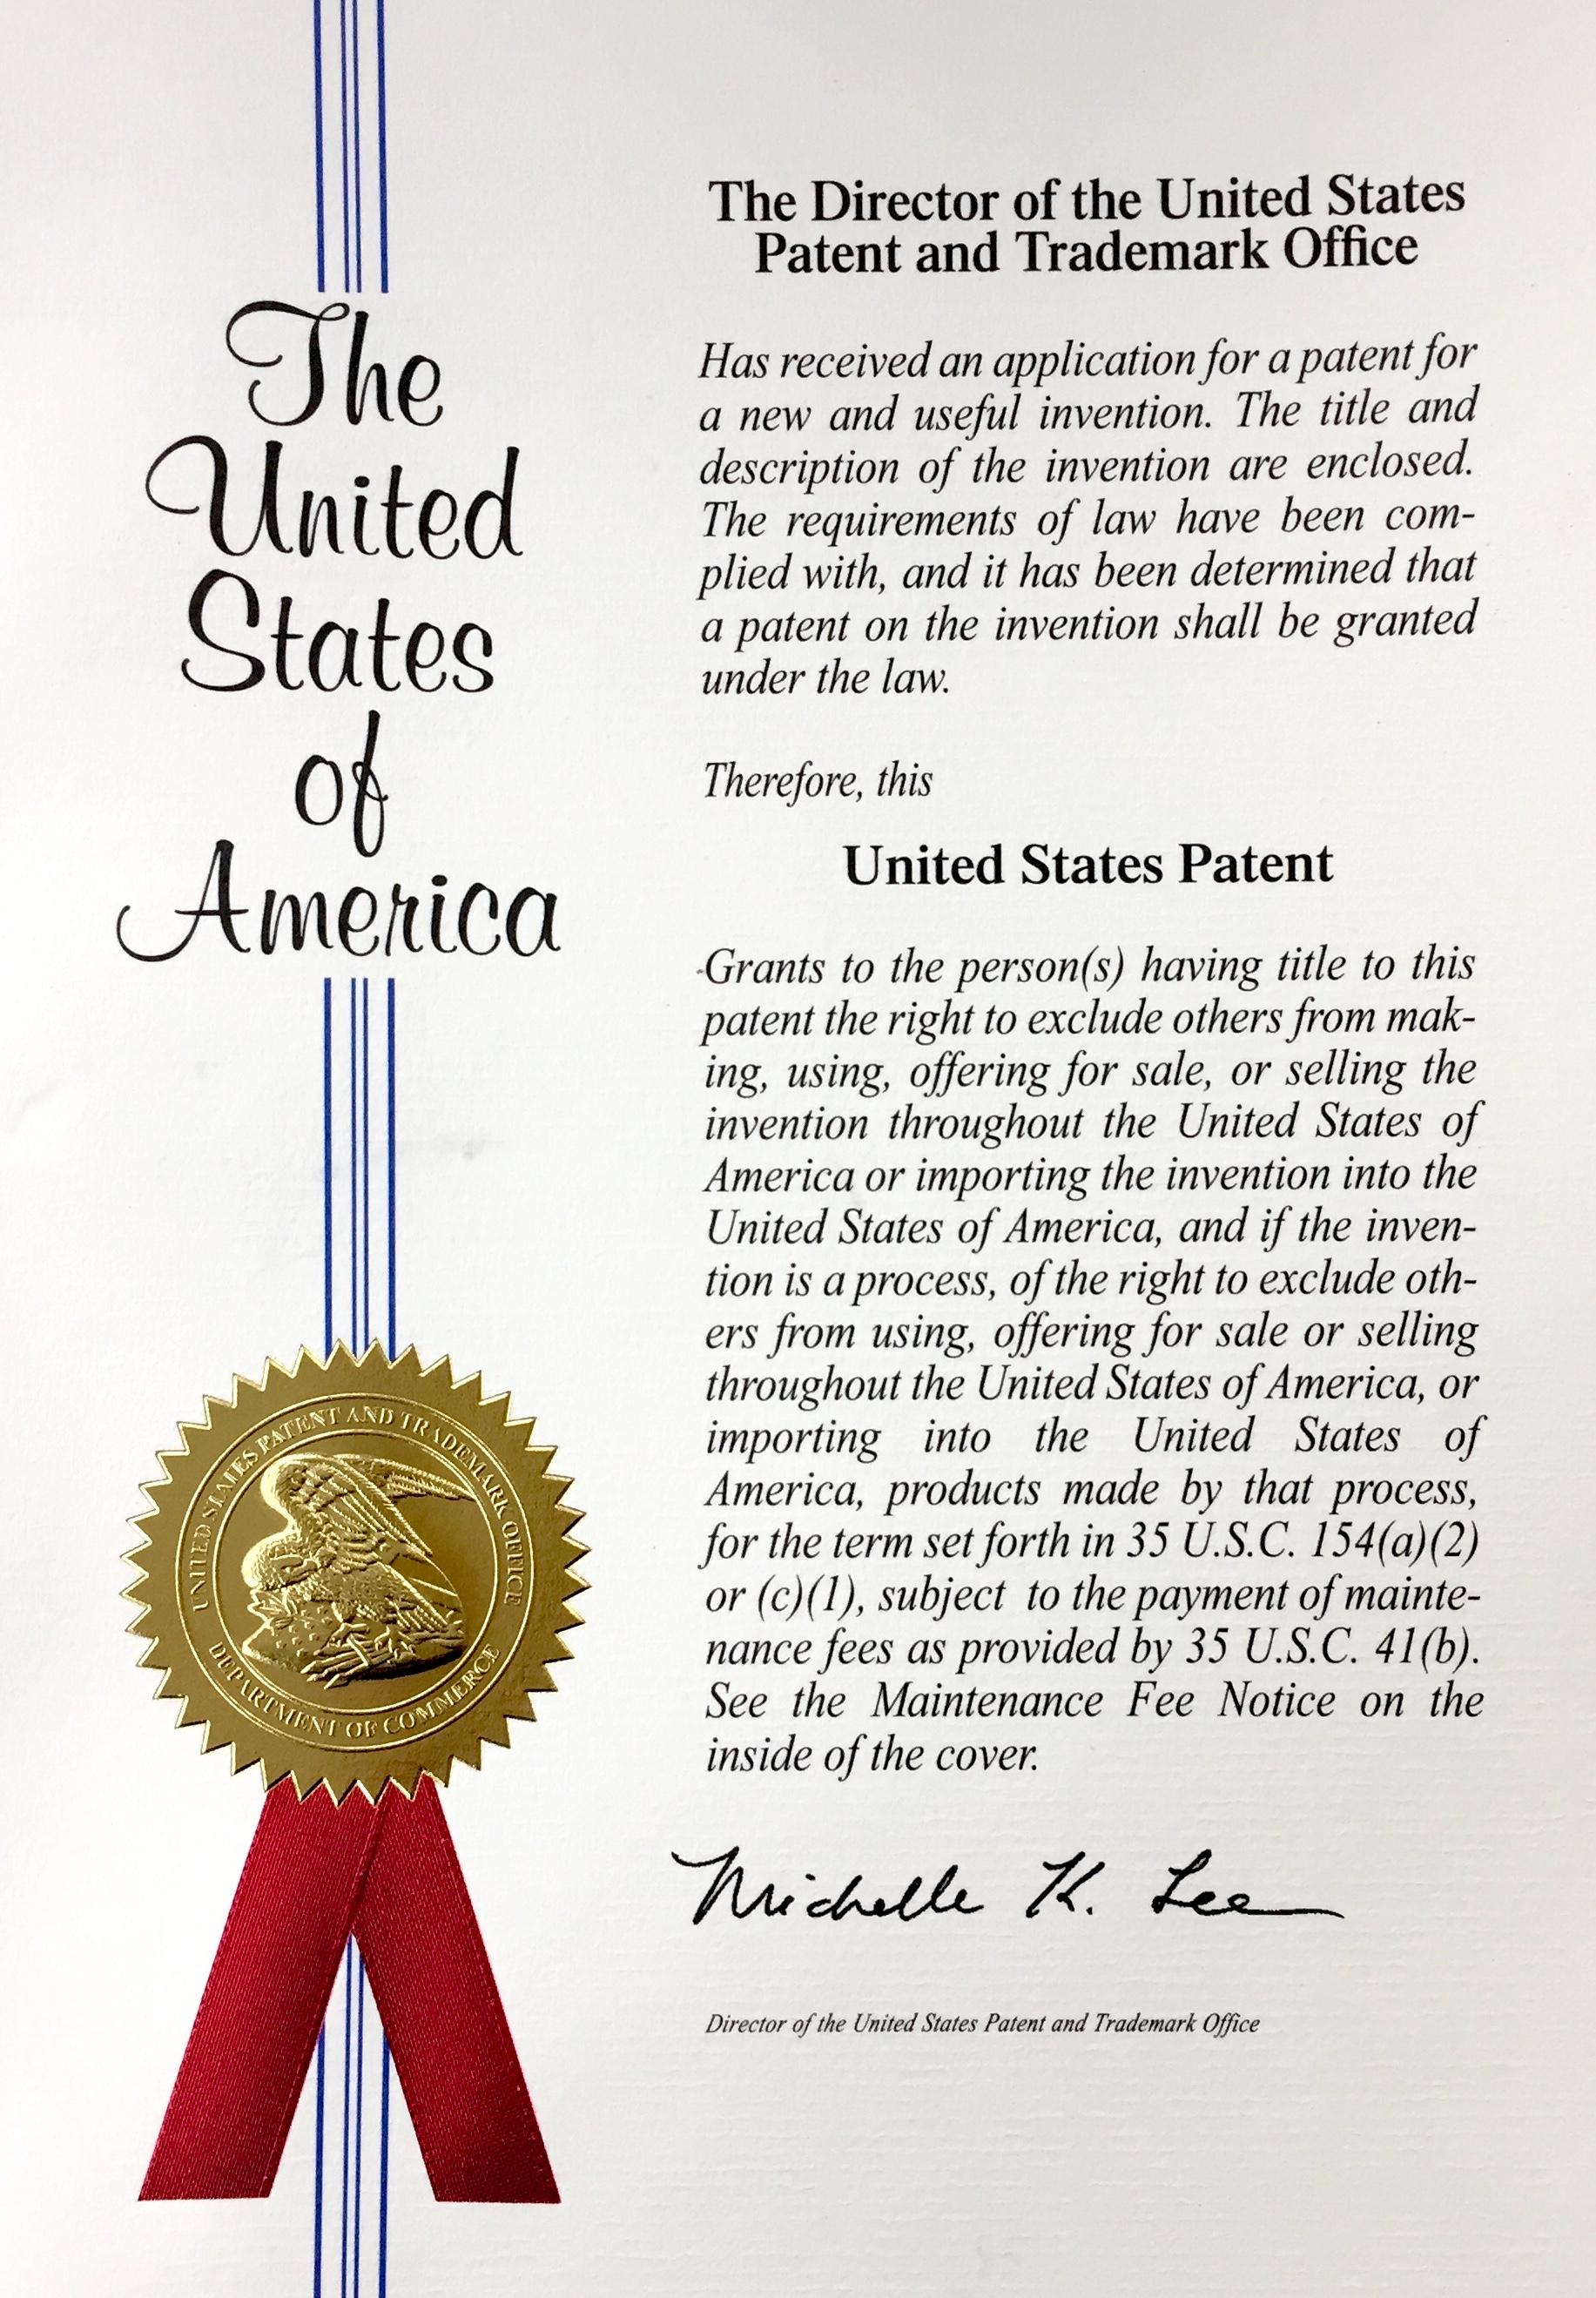 patent image stafford dolls.JPG